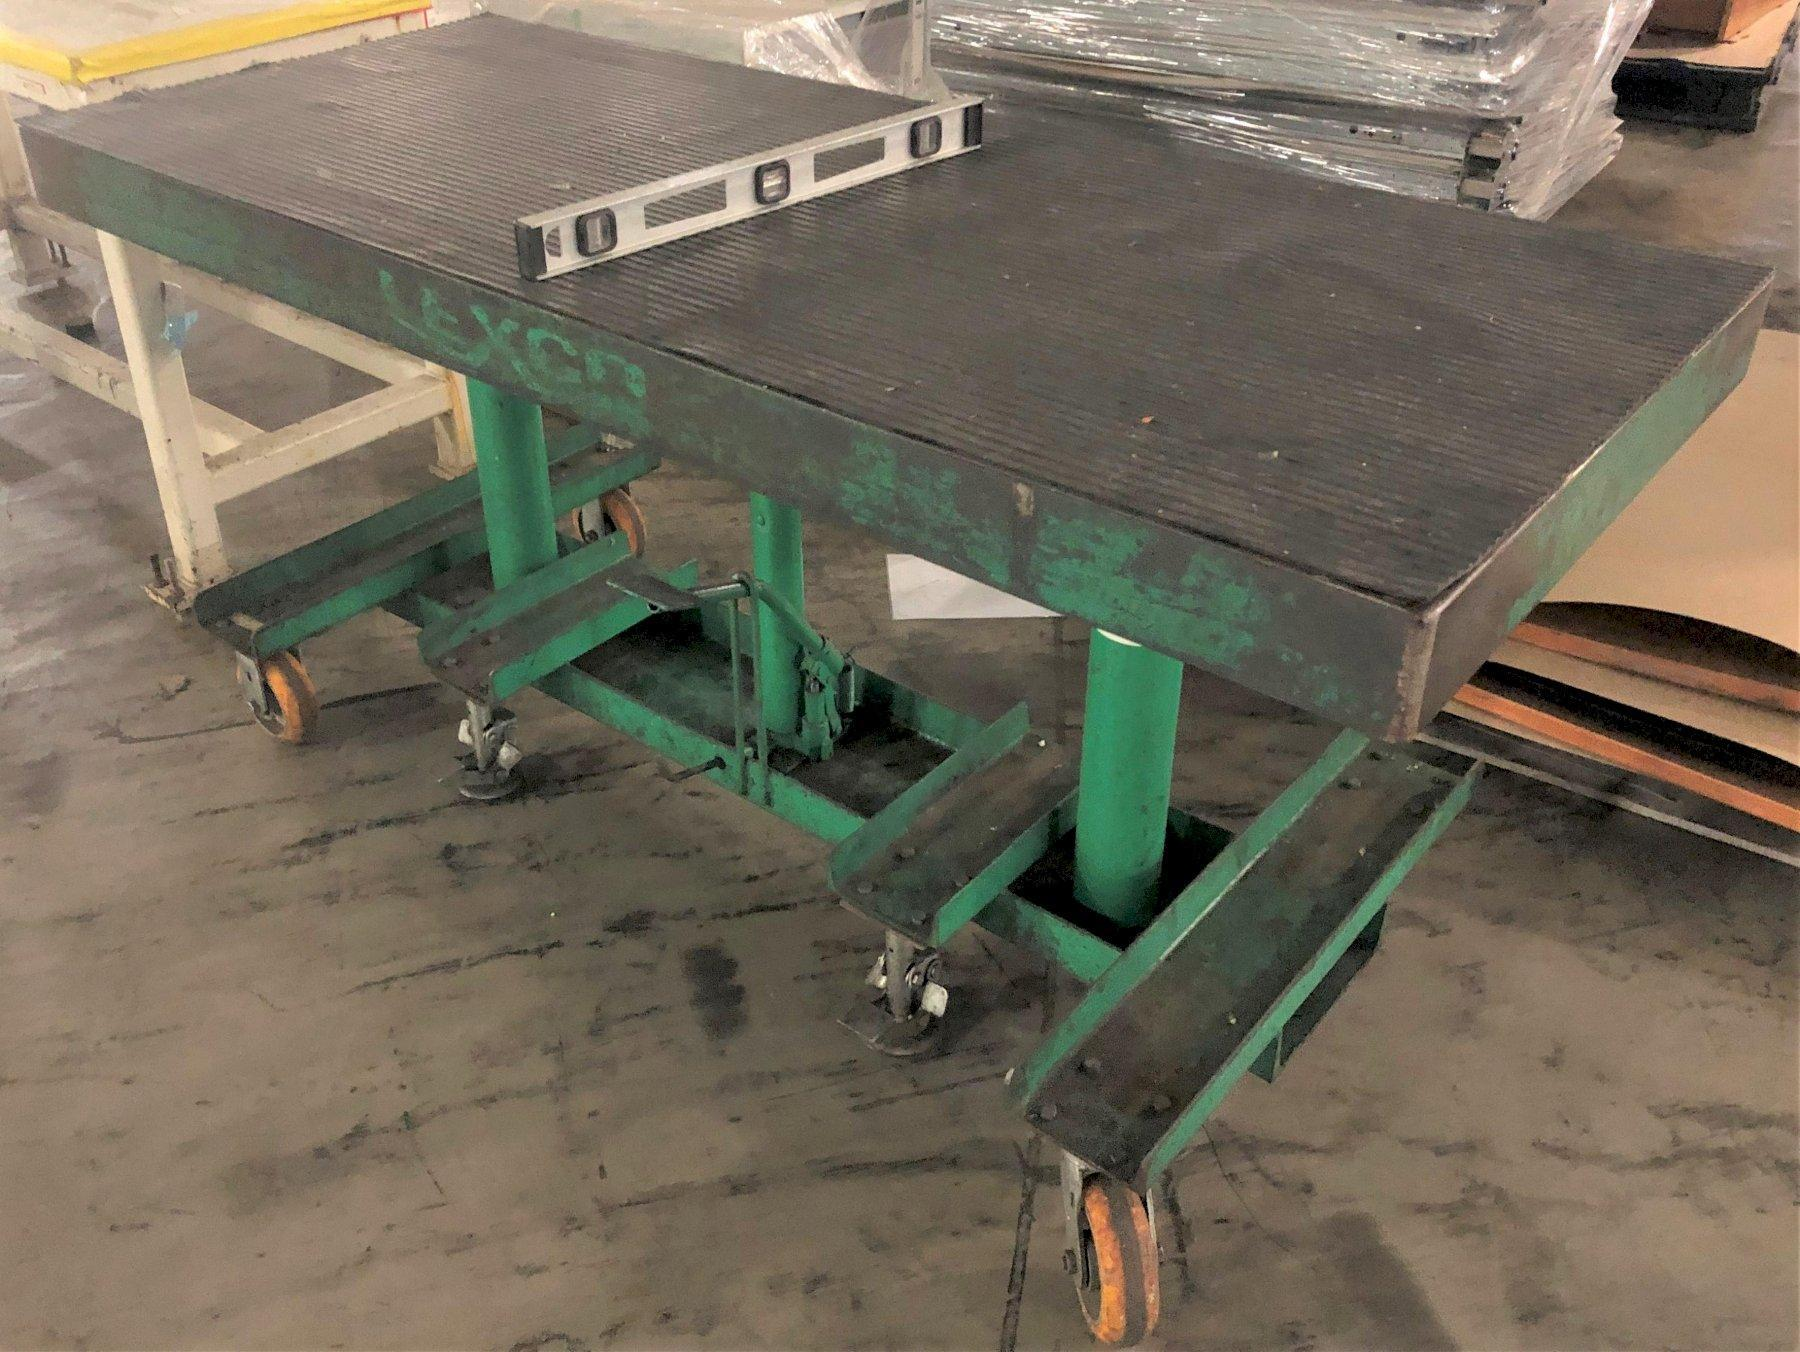 Wesco/Lexco Hydraulic Lift Table, 30″ x 72″ Platform, 2000 Lb. Capacity